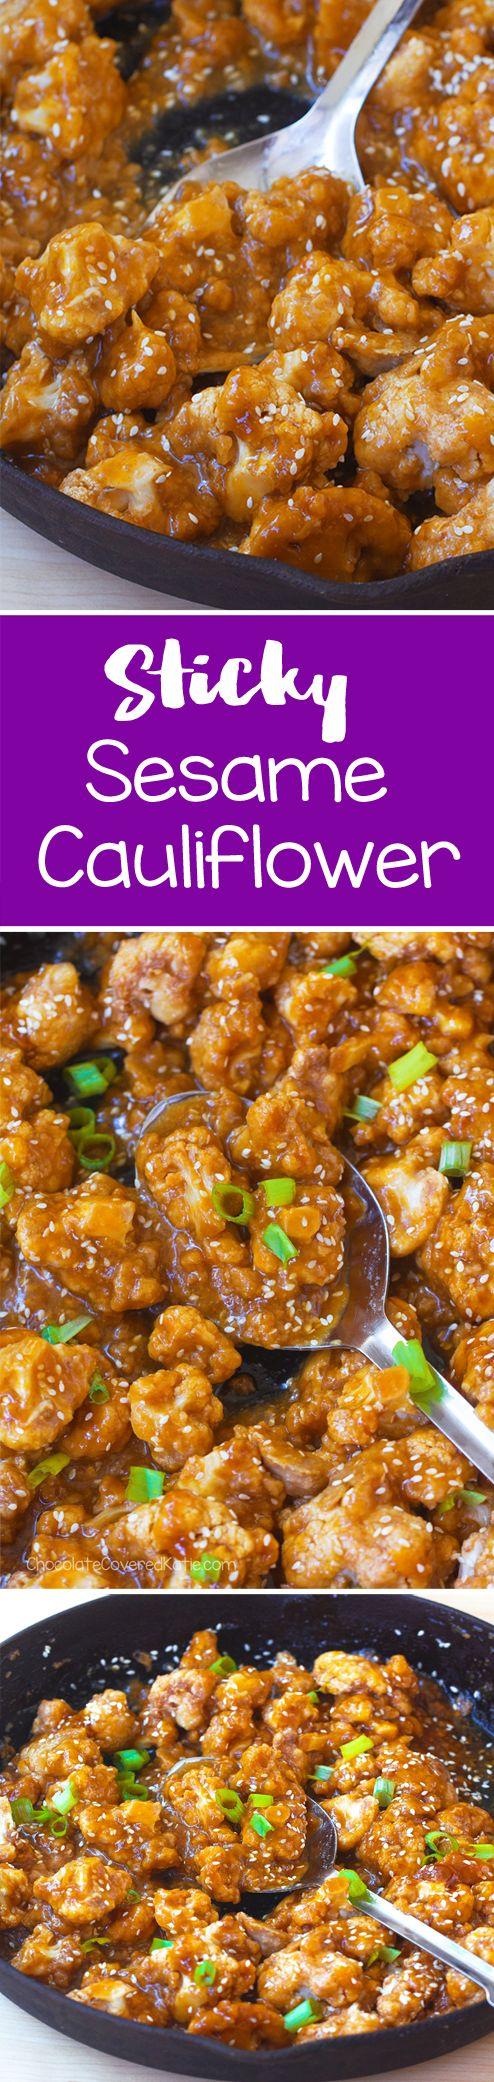 Sticky Sesame Cauliflower. The sauce is so addictive!